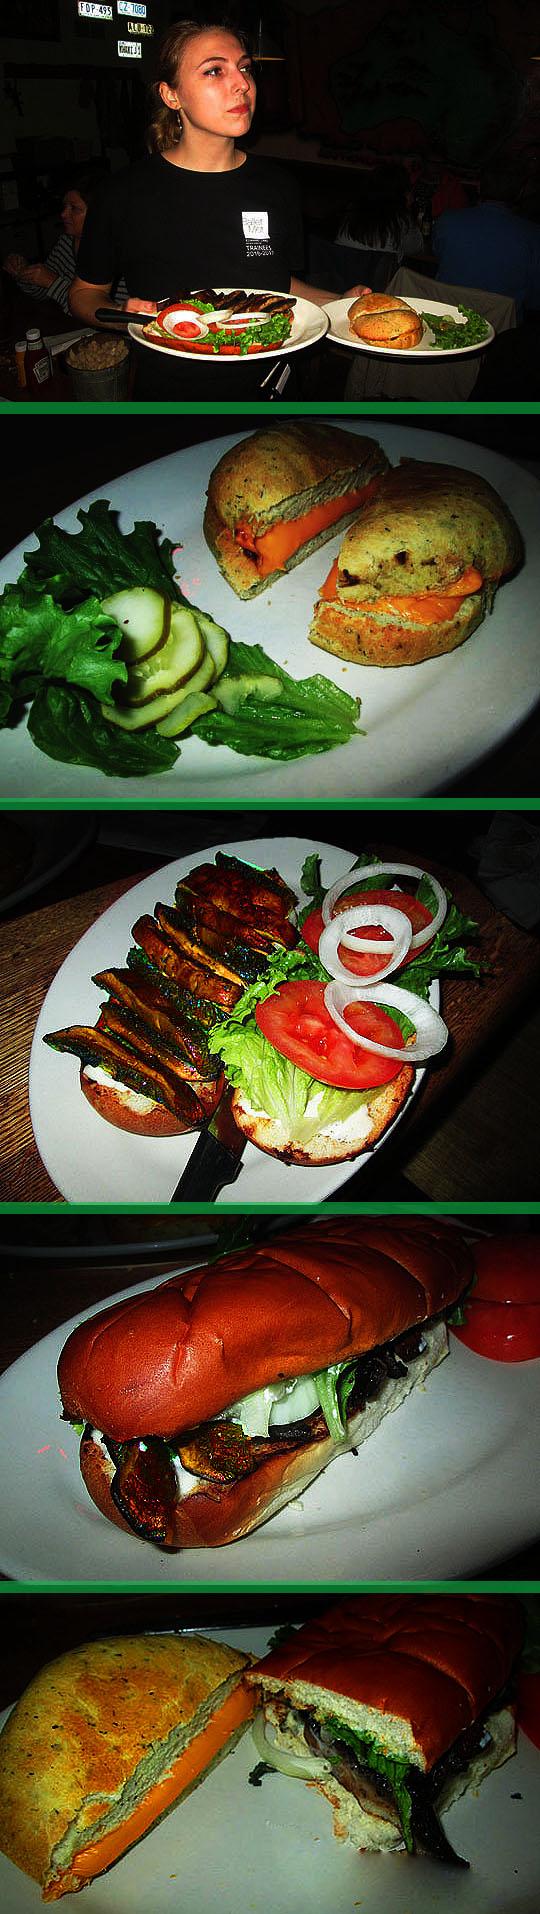 11. sandwiches_nov6-17.jpg